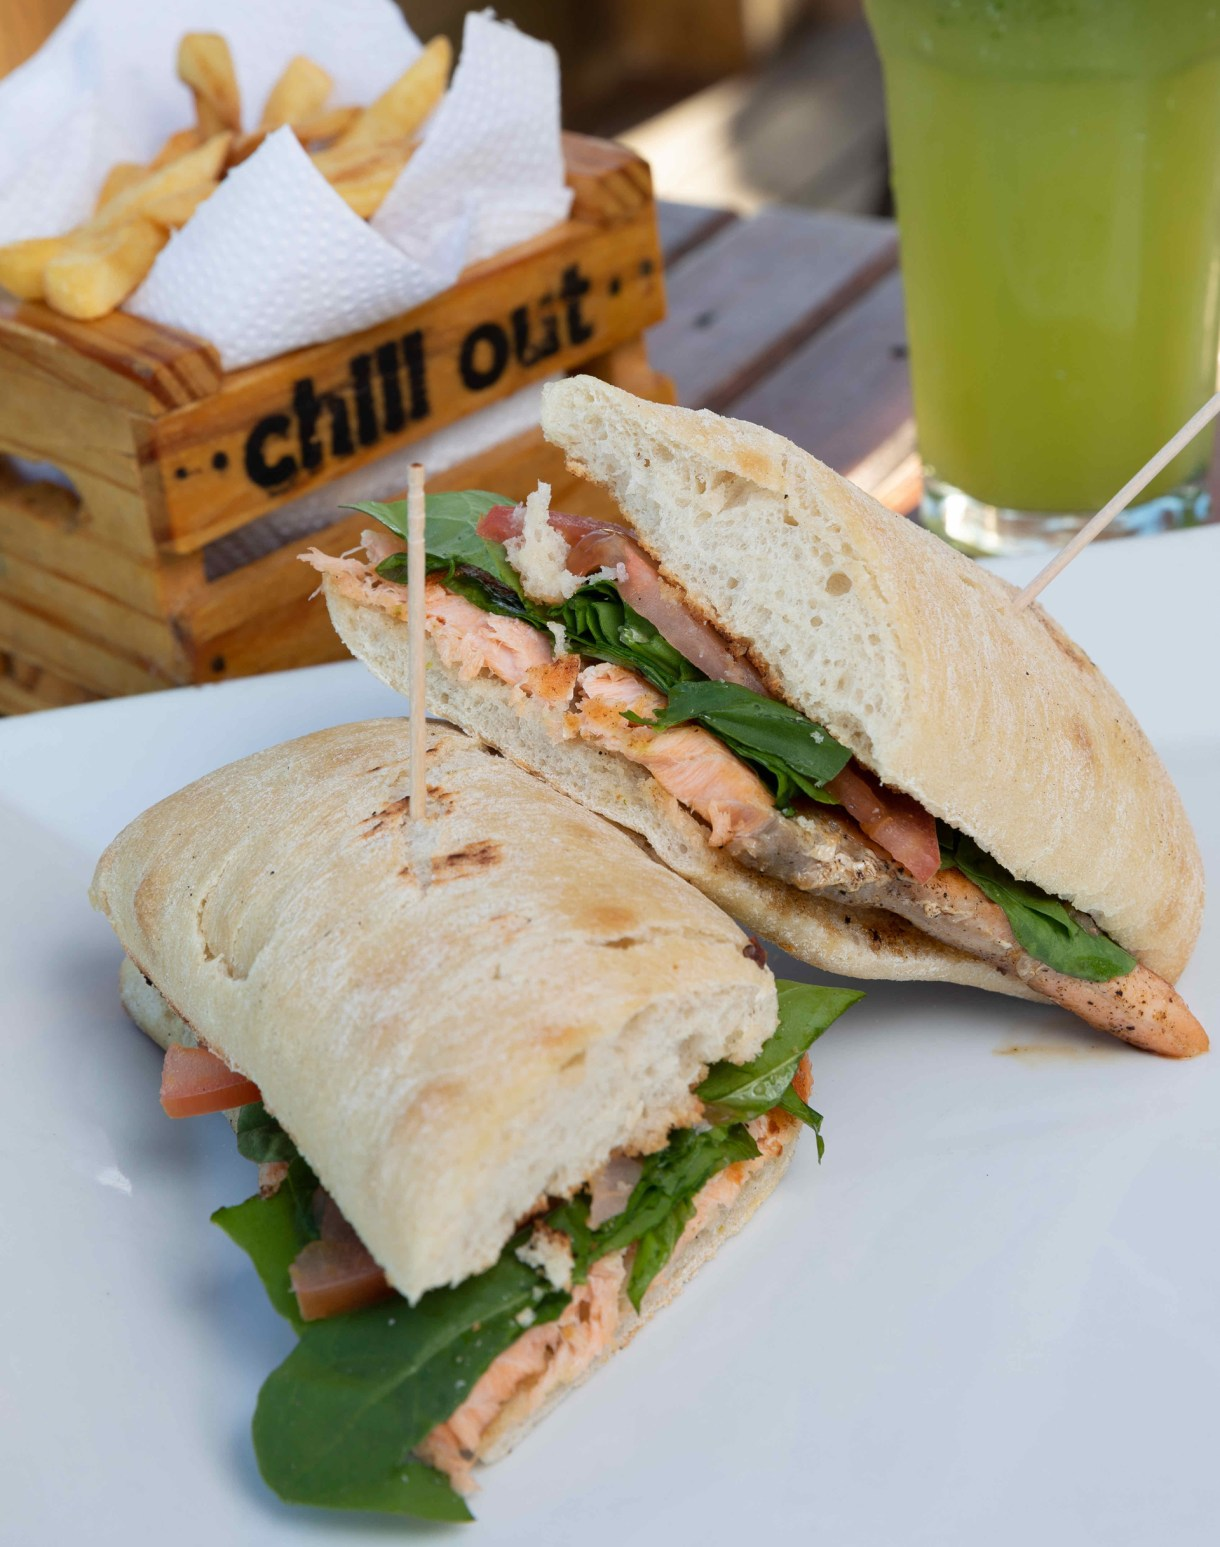 Chivito de salmón, una estrella de Chill Out en Punta del Este (Chill Out)